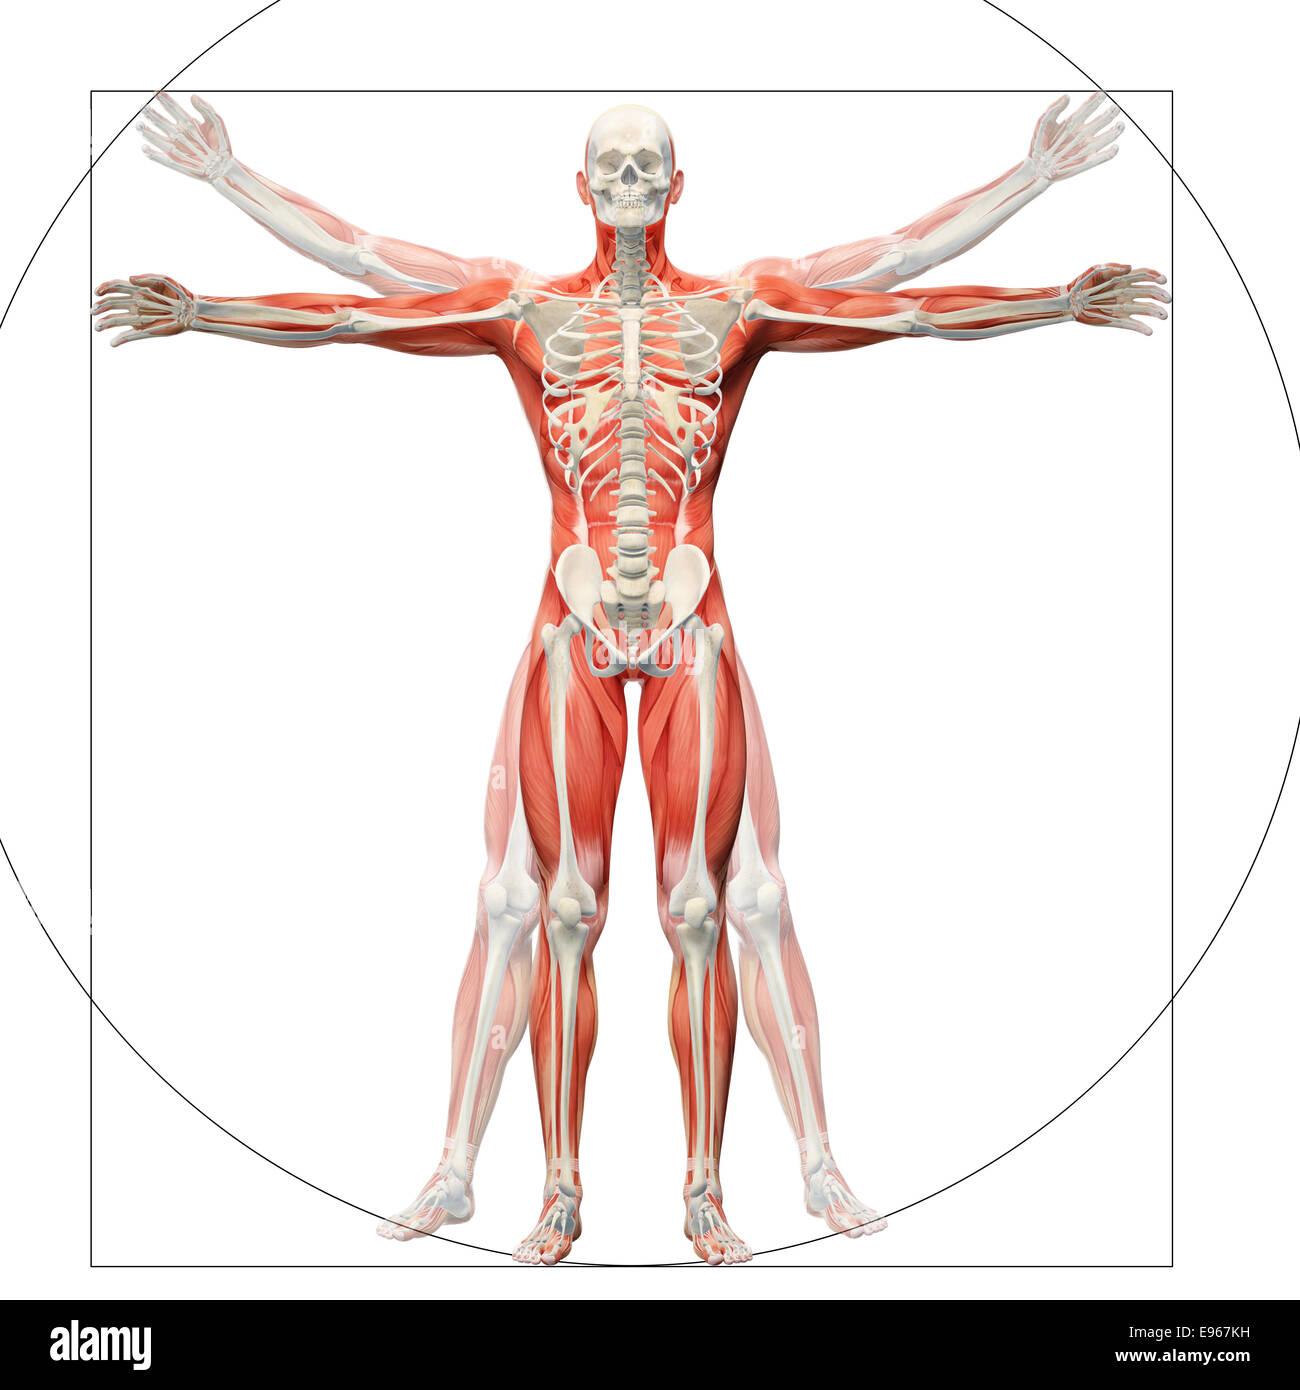 Anatomía Humana aparece como el hombre de vitruvian por Leonardo da Vinci Imagen De Stock